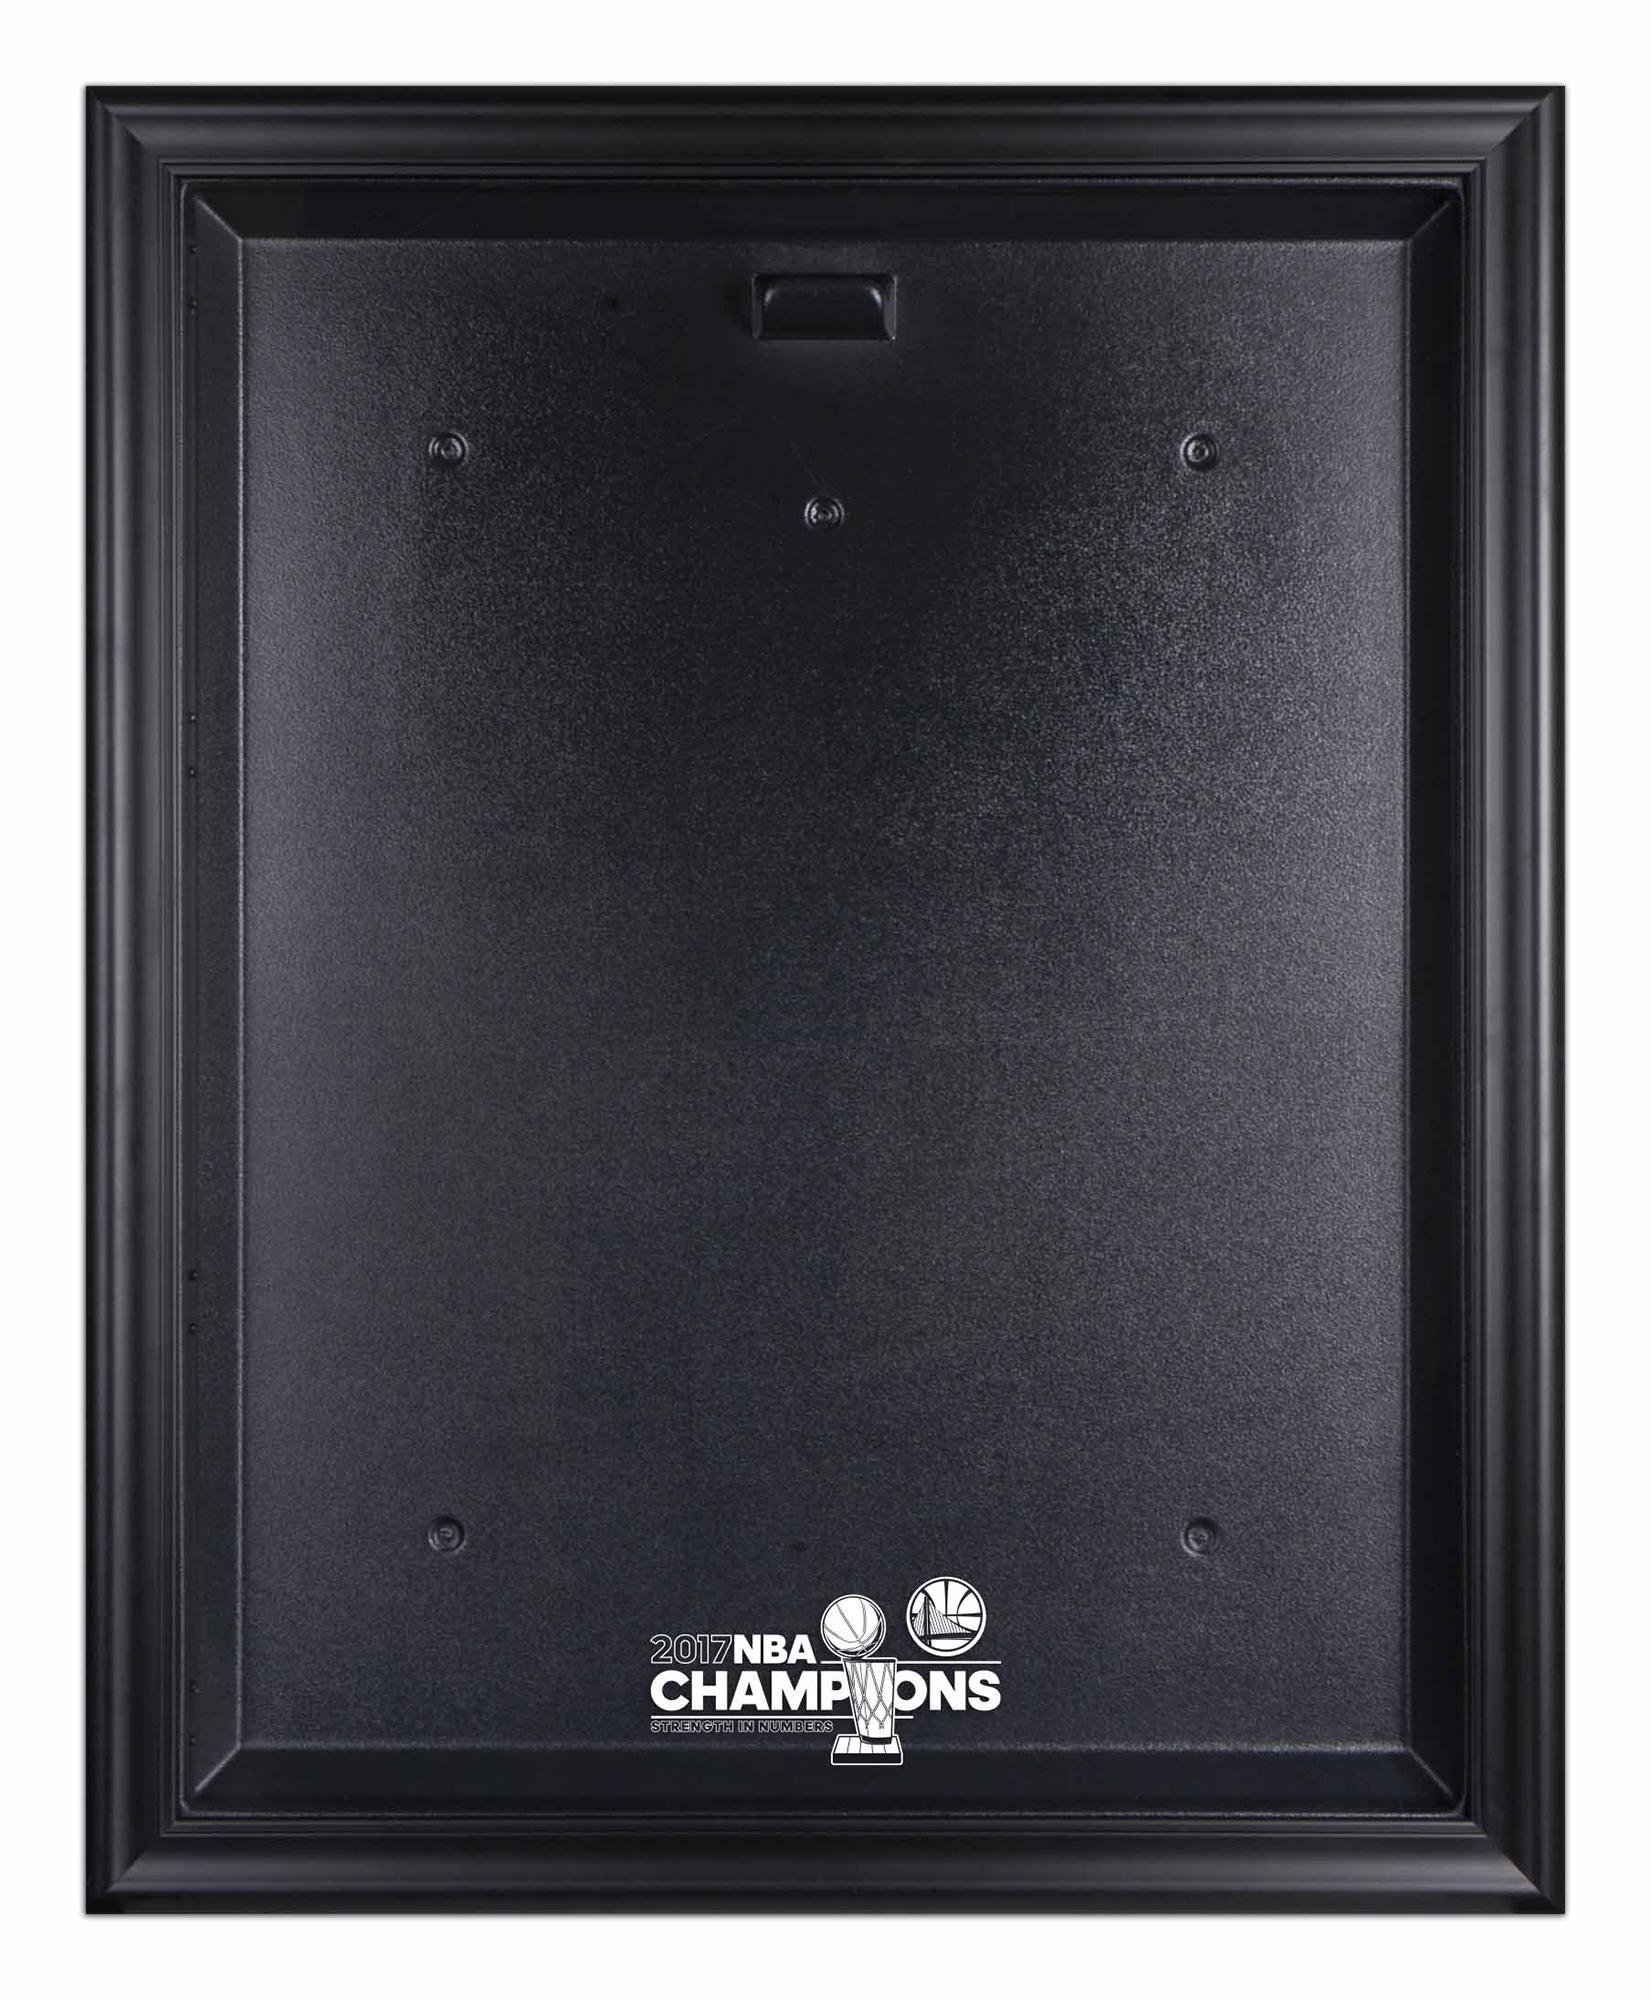 Golden State Warriors 2017 NBA Finals Champions Logo Black Framed Jersey Display Case - Fanatics Authentic Certified